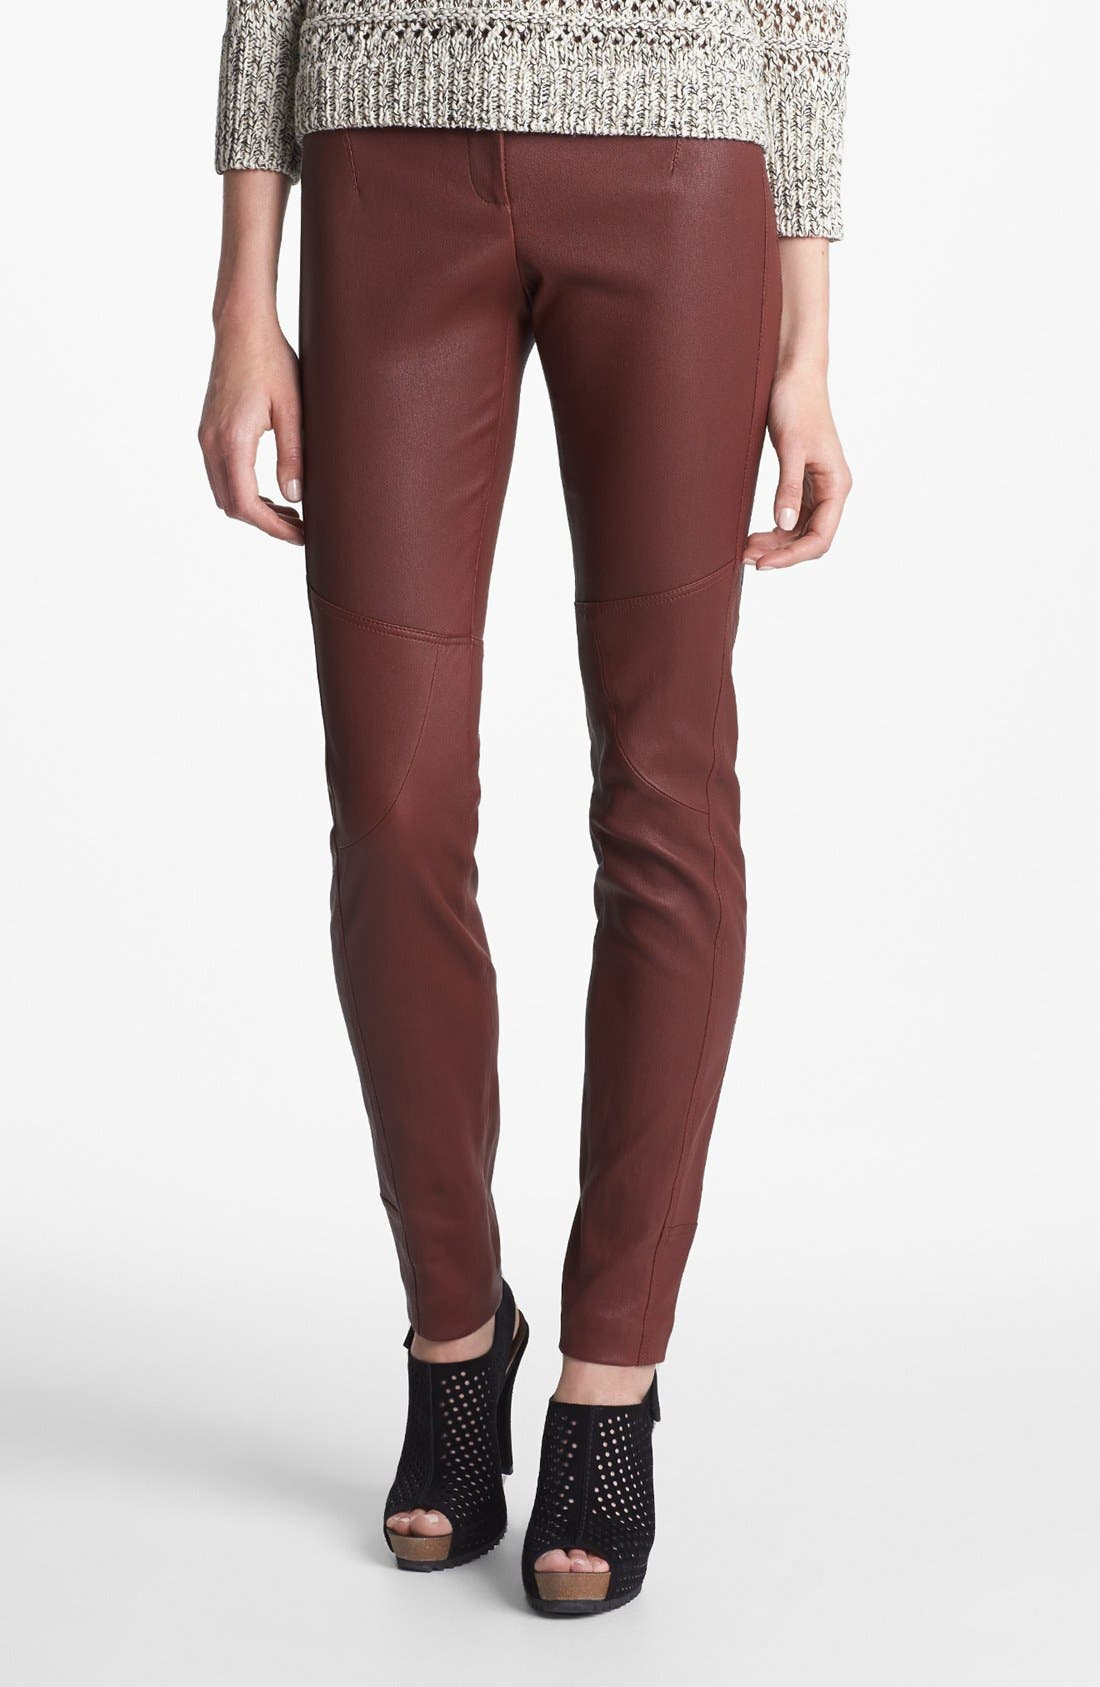 Alternate Image 1 Selected - Diane von Furstenberg 'Liberty' Leather Pants